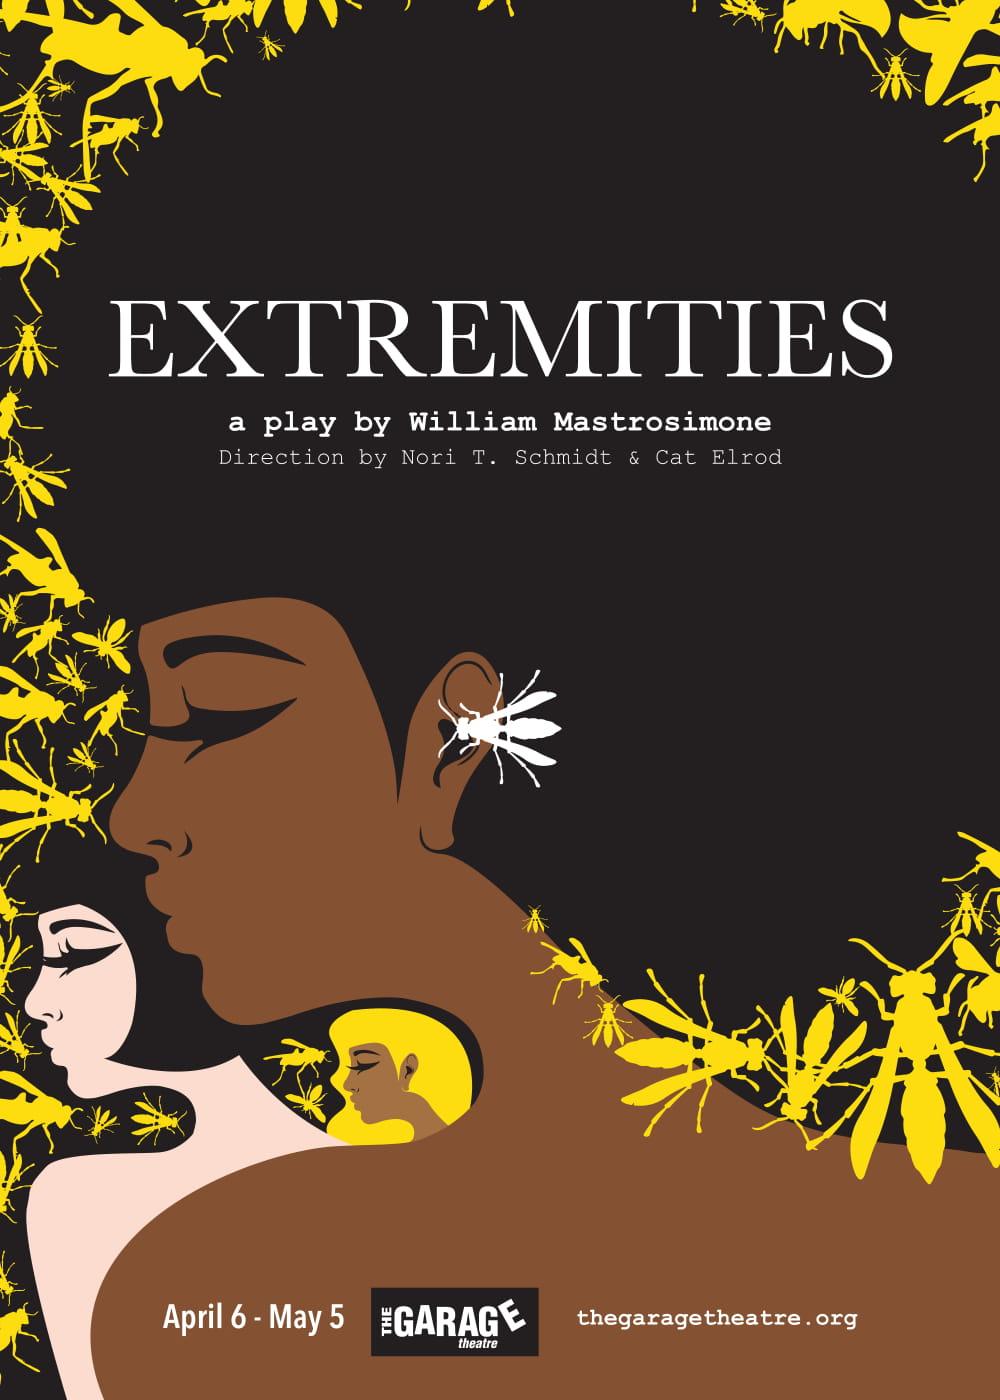 ExtremitiesPostcard_03-1.jpg